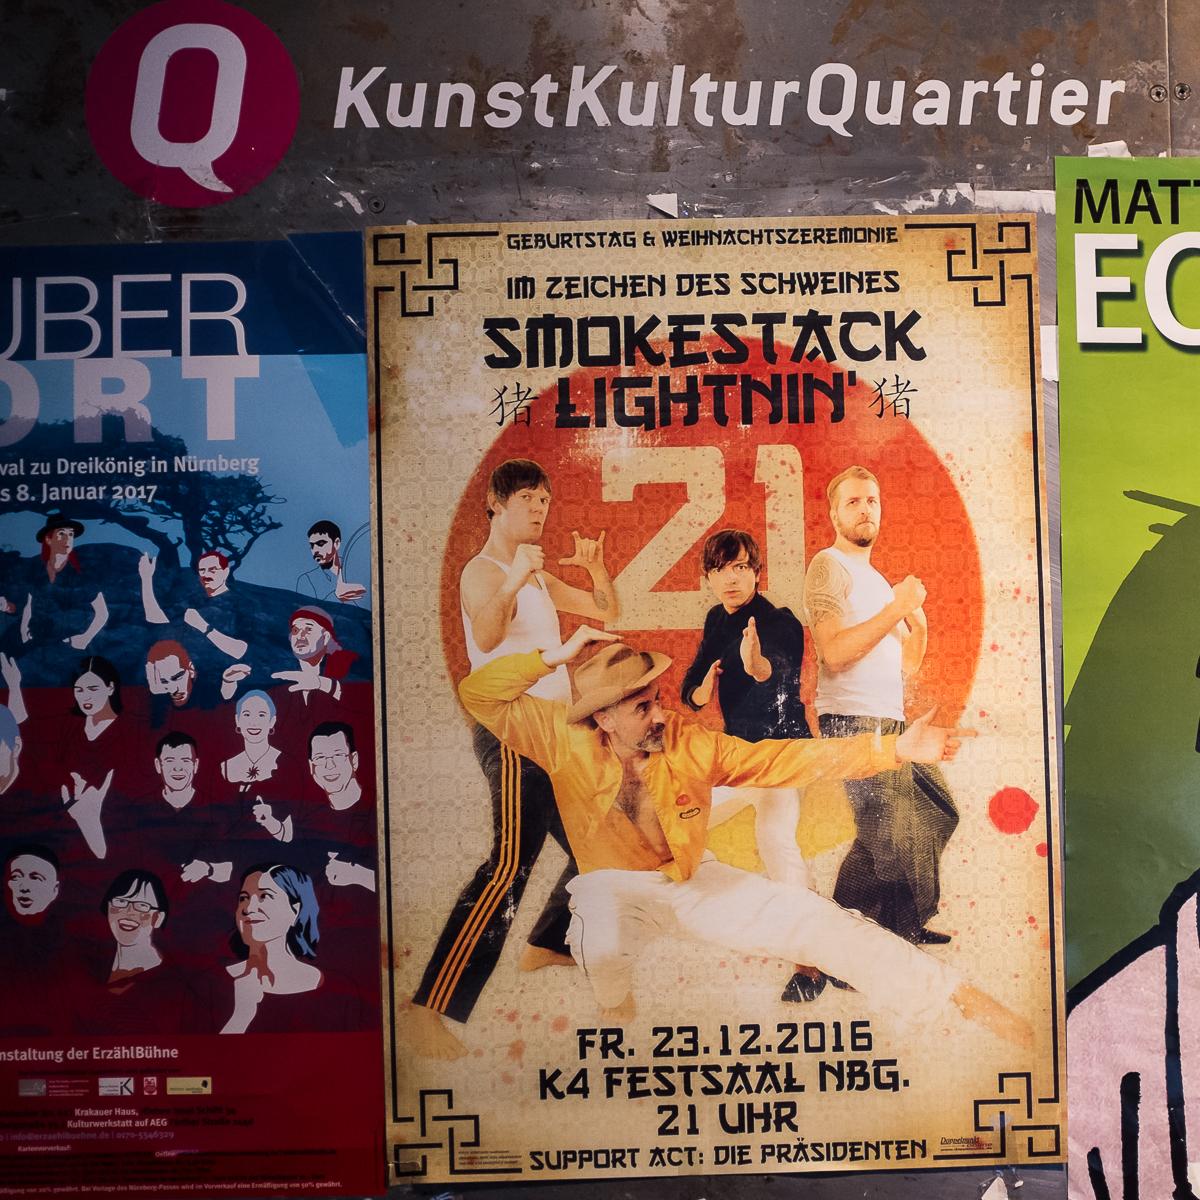 Konzert Reportage Fotografie Smokestack Lightnin' Künstlerhaus Nürnberg